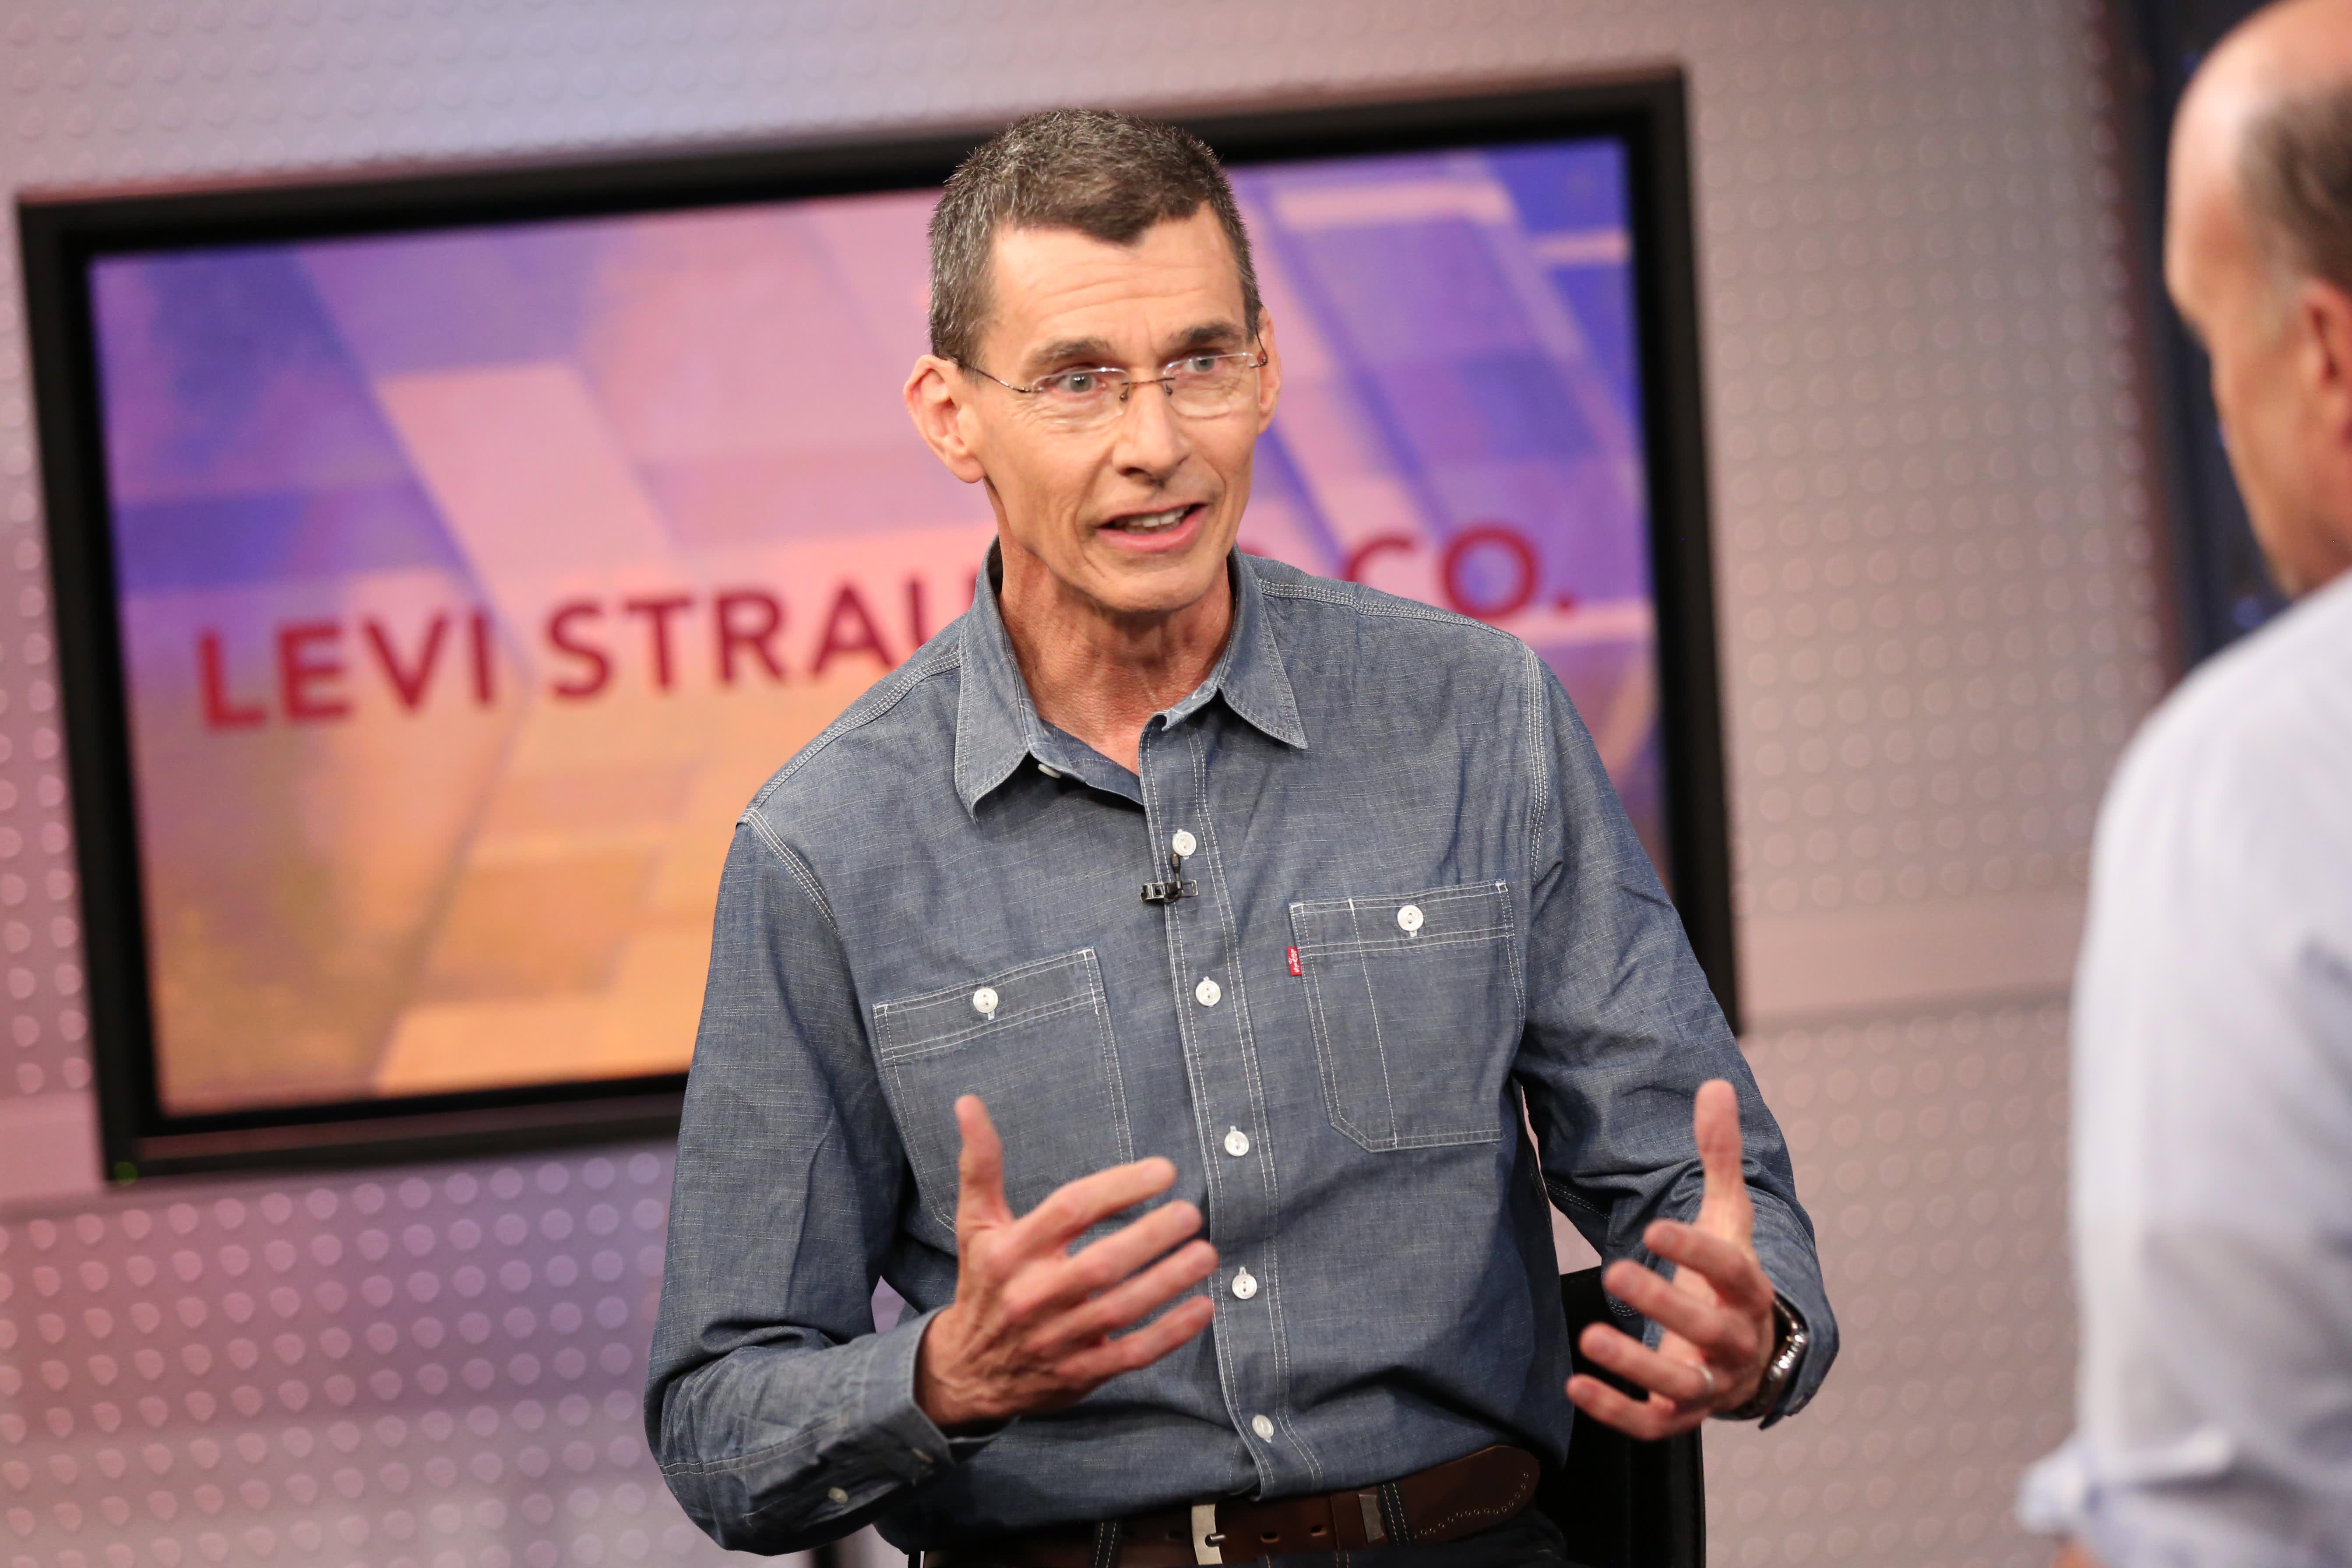 Levi's CEO: 'The best innovation happens when you've got constraints'